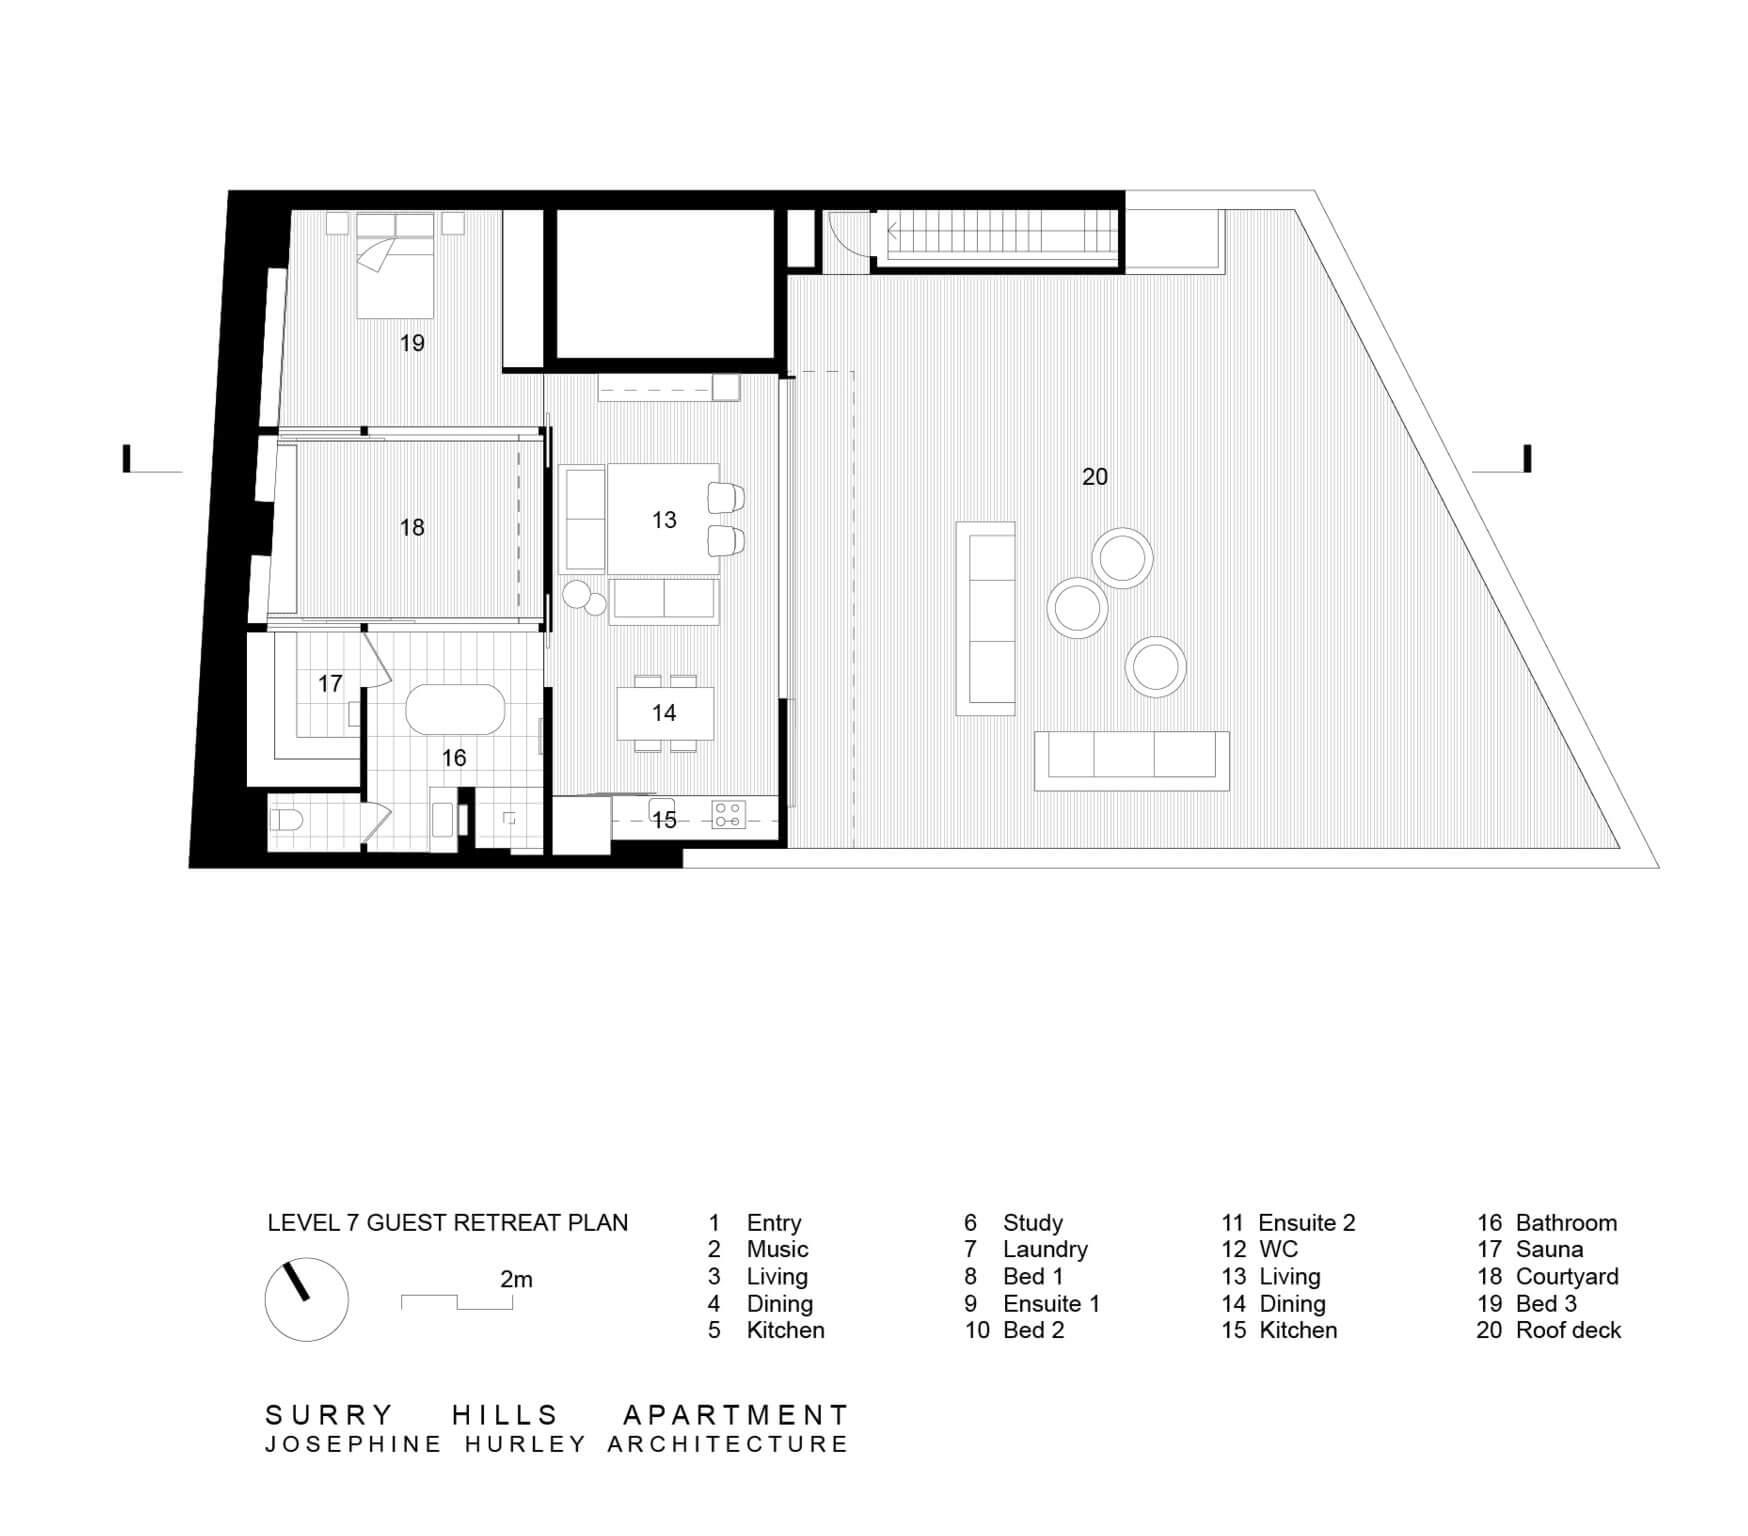 Designer: Josephine Hurley Architecture